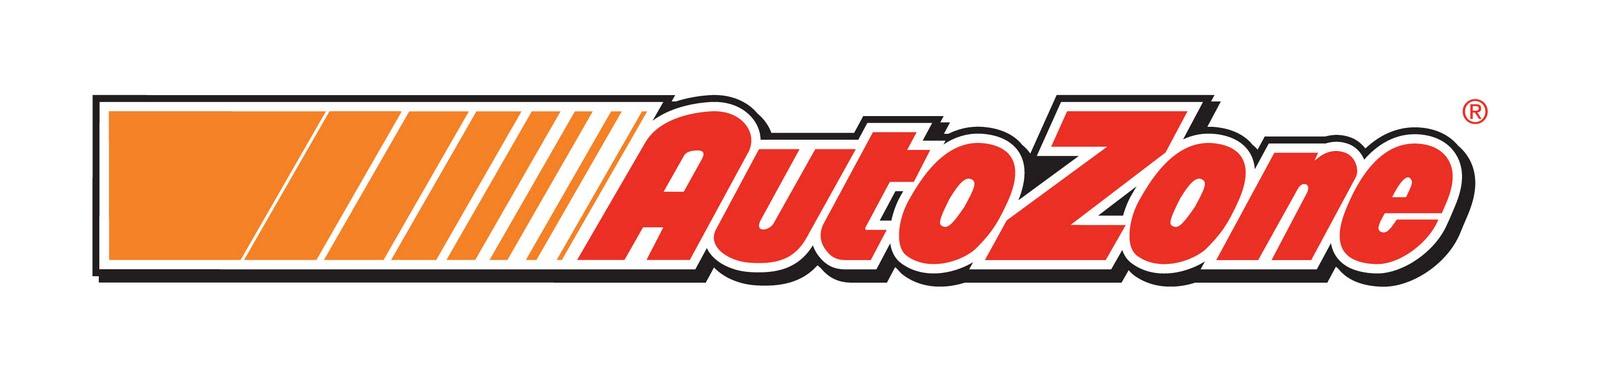 Gallery For > Autozone Logo